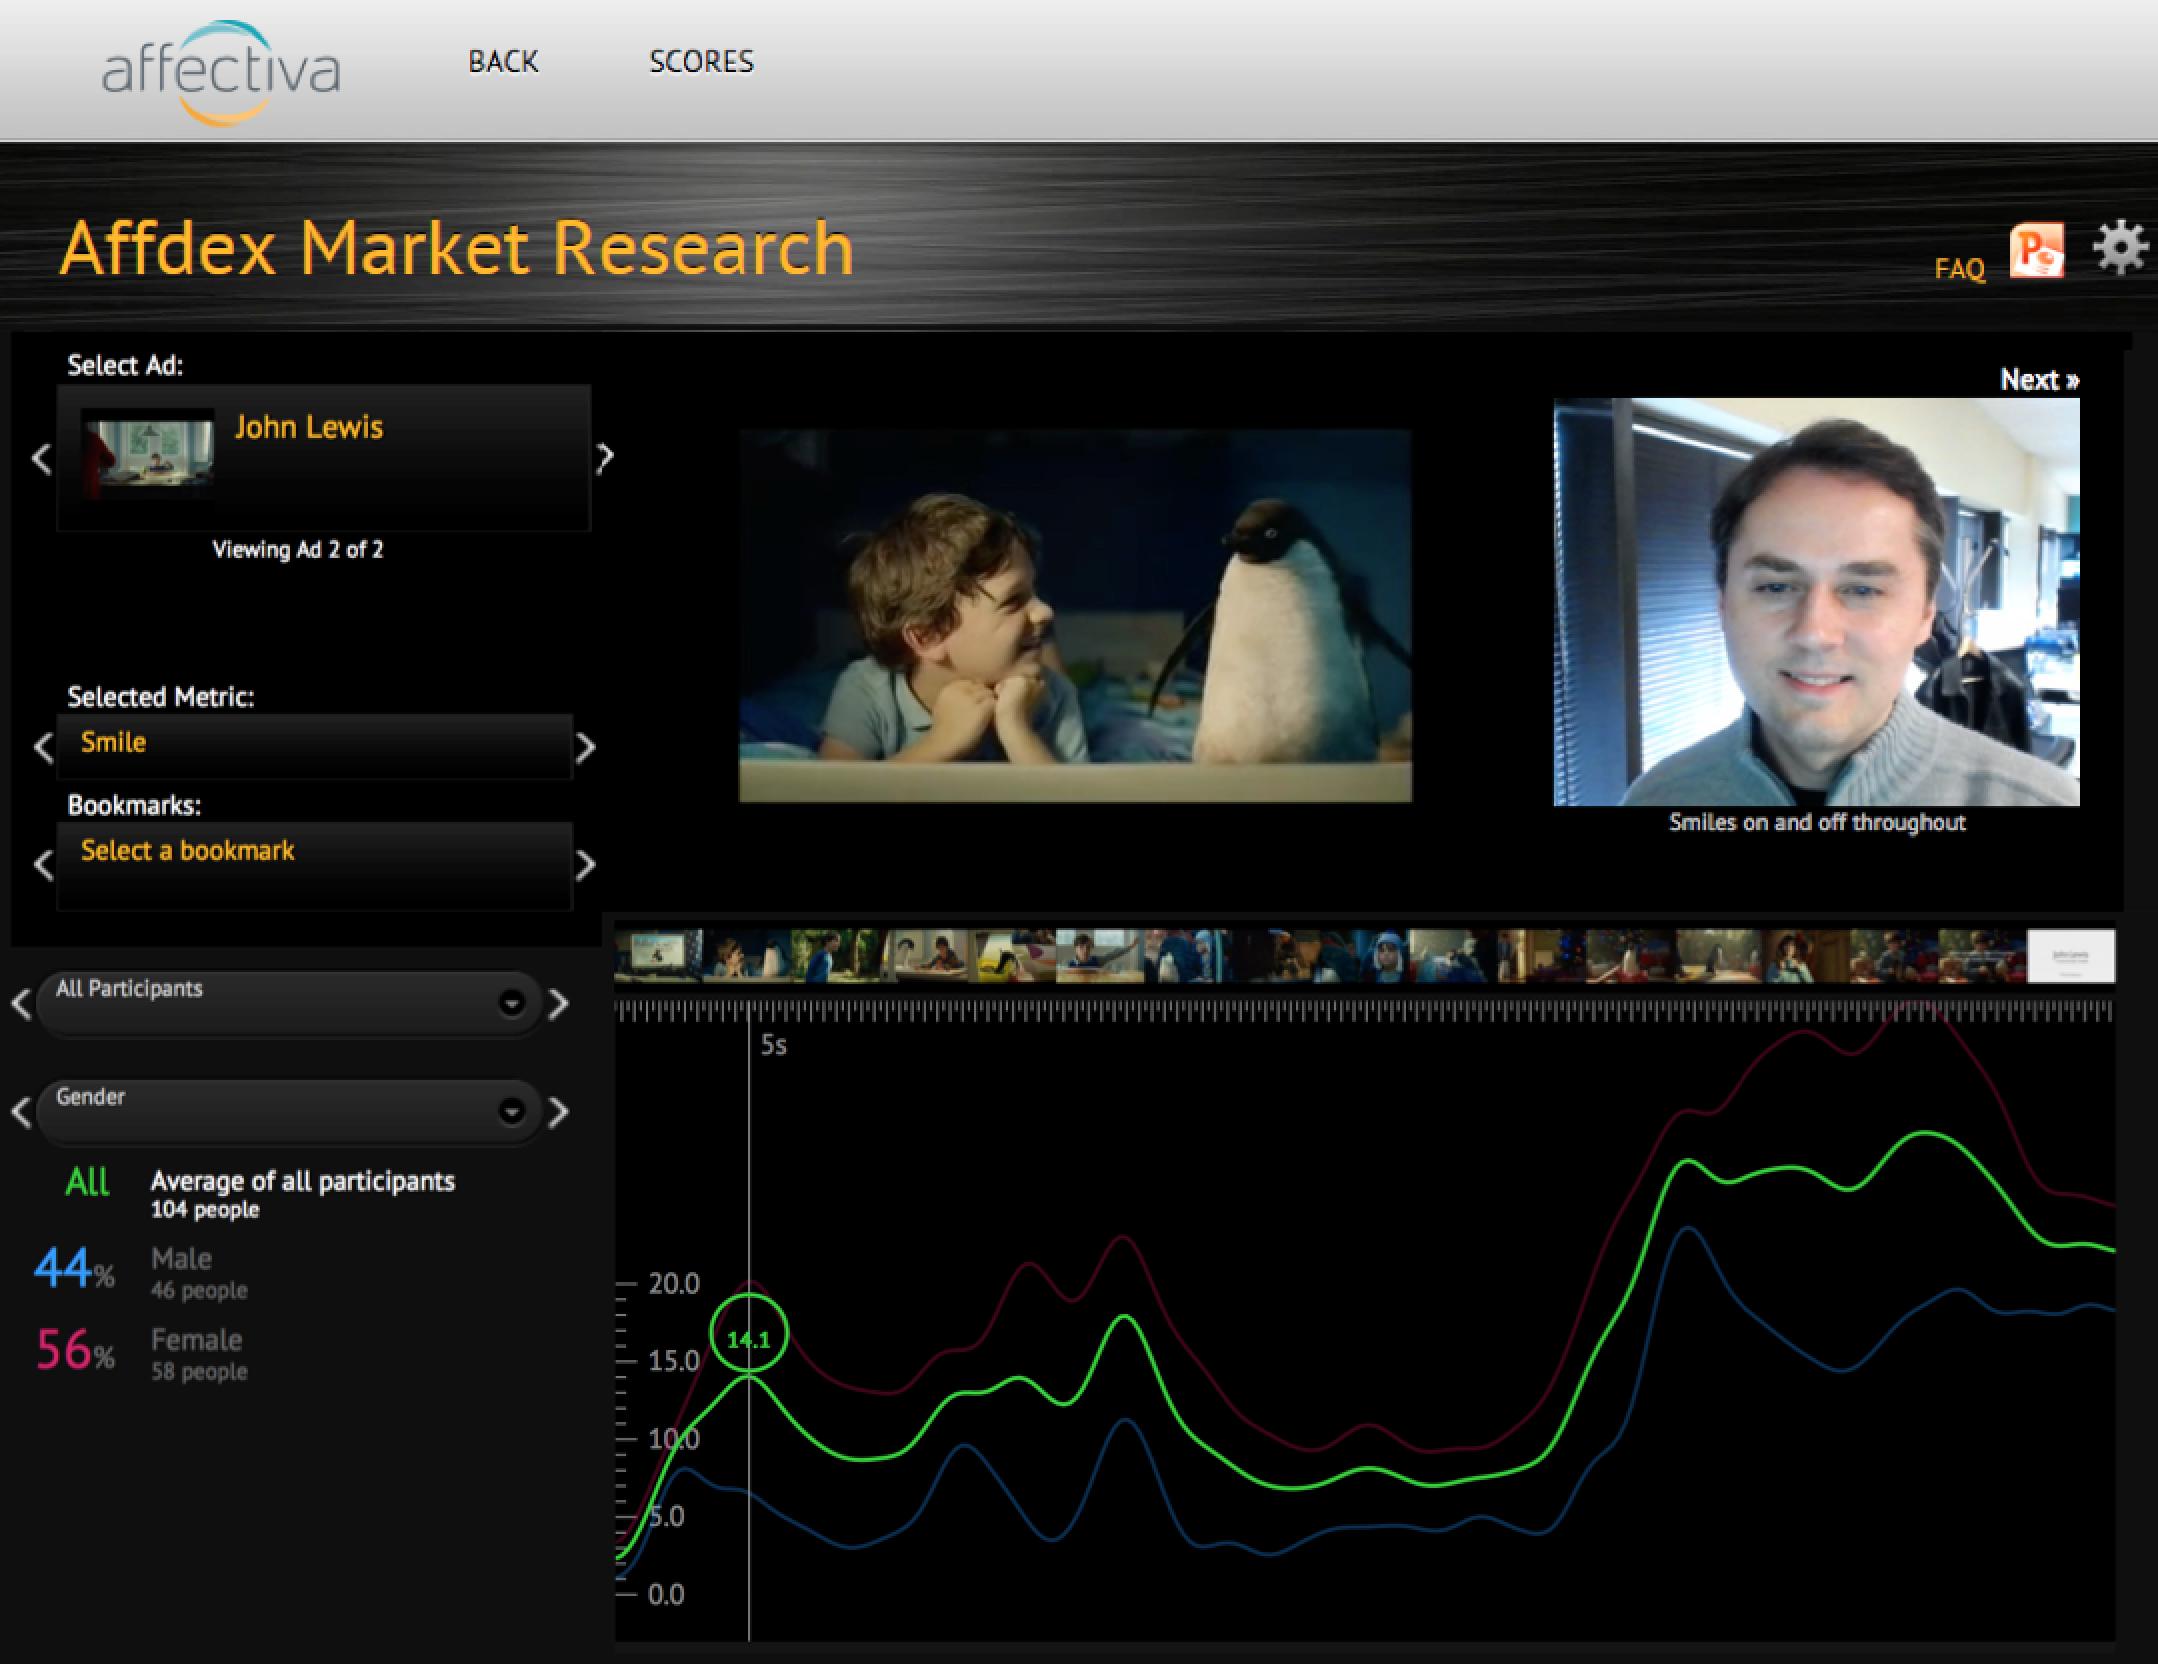 Affdex Market Research Dashboard